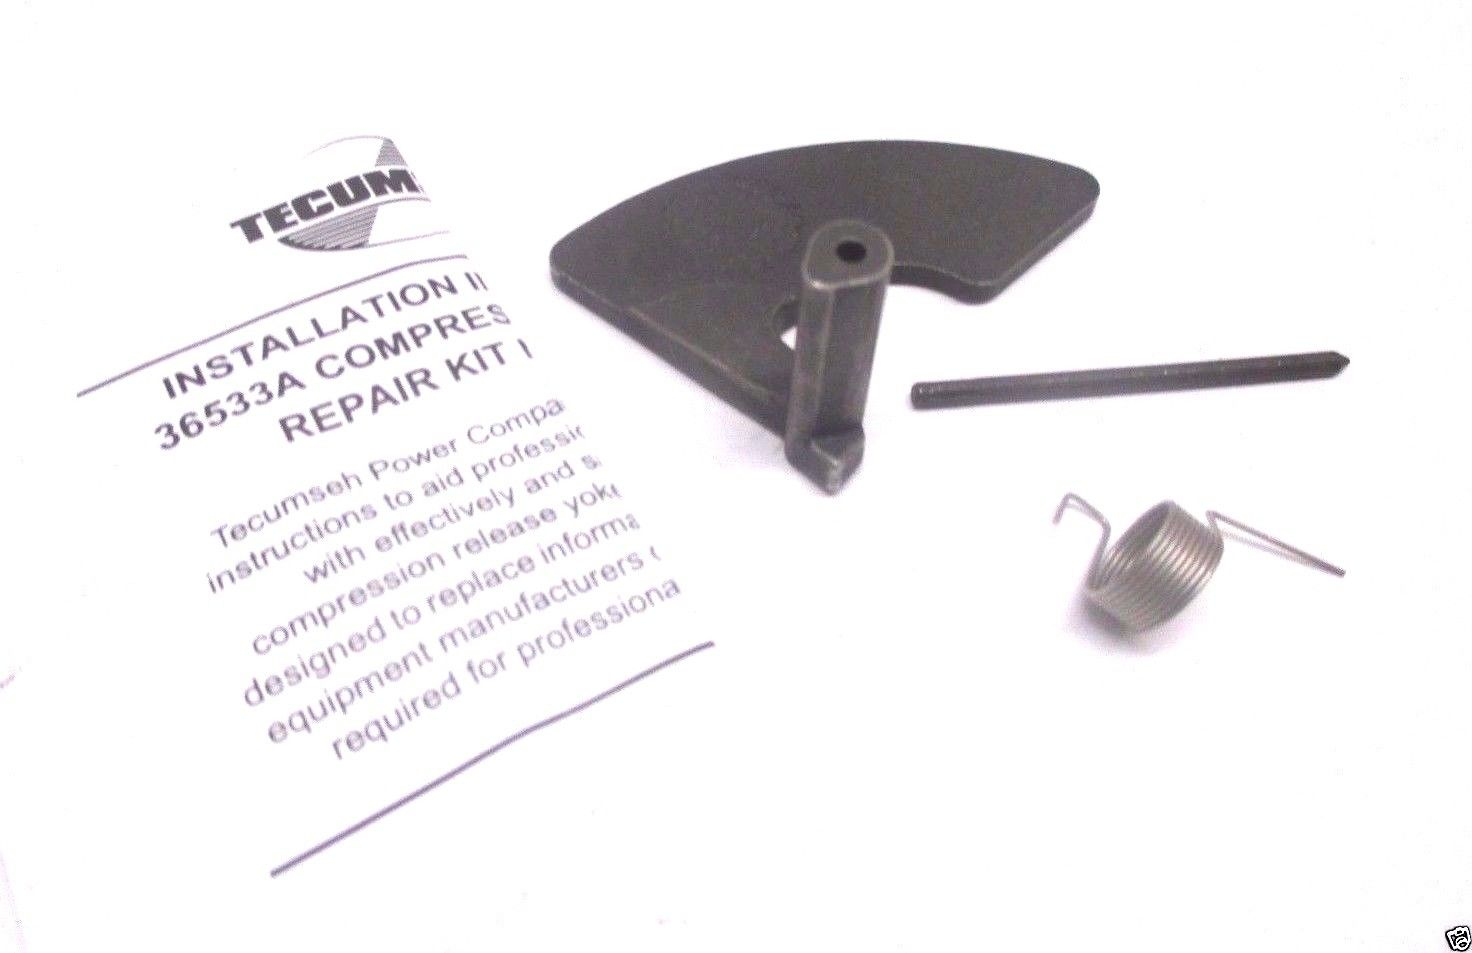 Genuine Tecumseh 730656 Camshaft Repair Kit Fits OHV135 OHV140 OHV145 OHV14 OHV